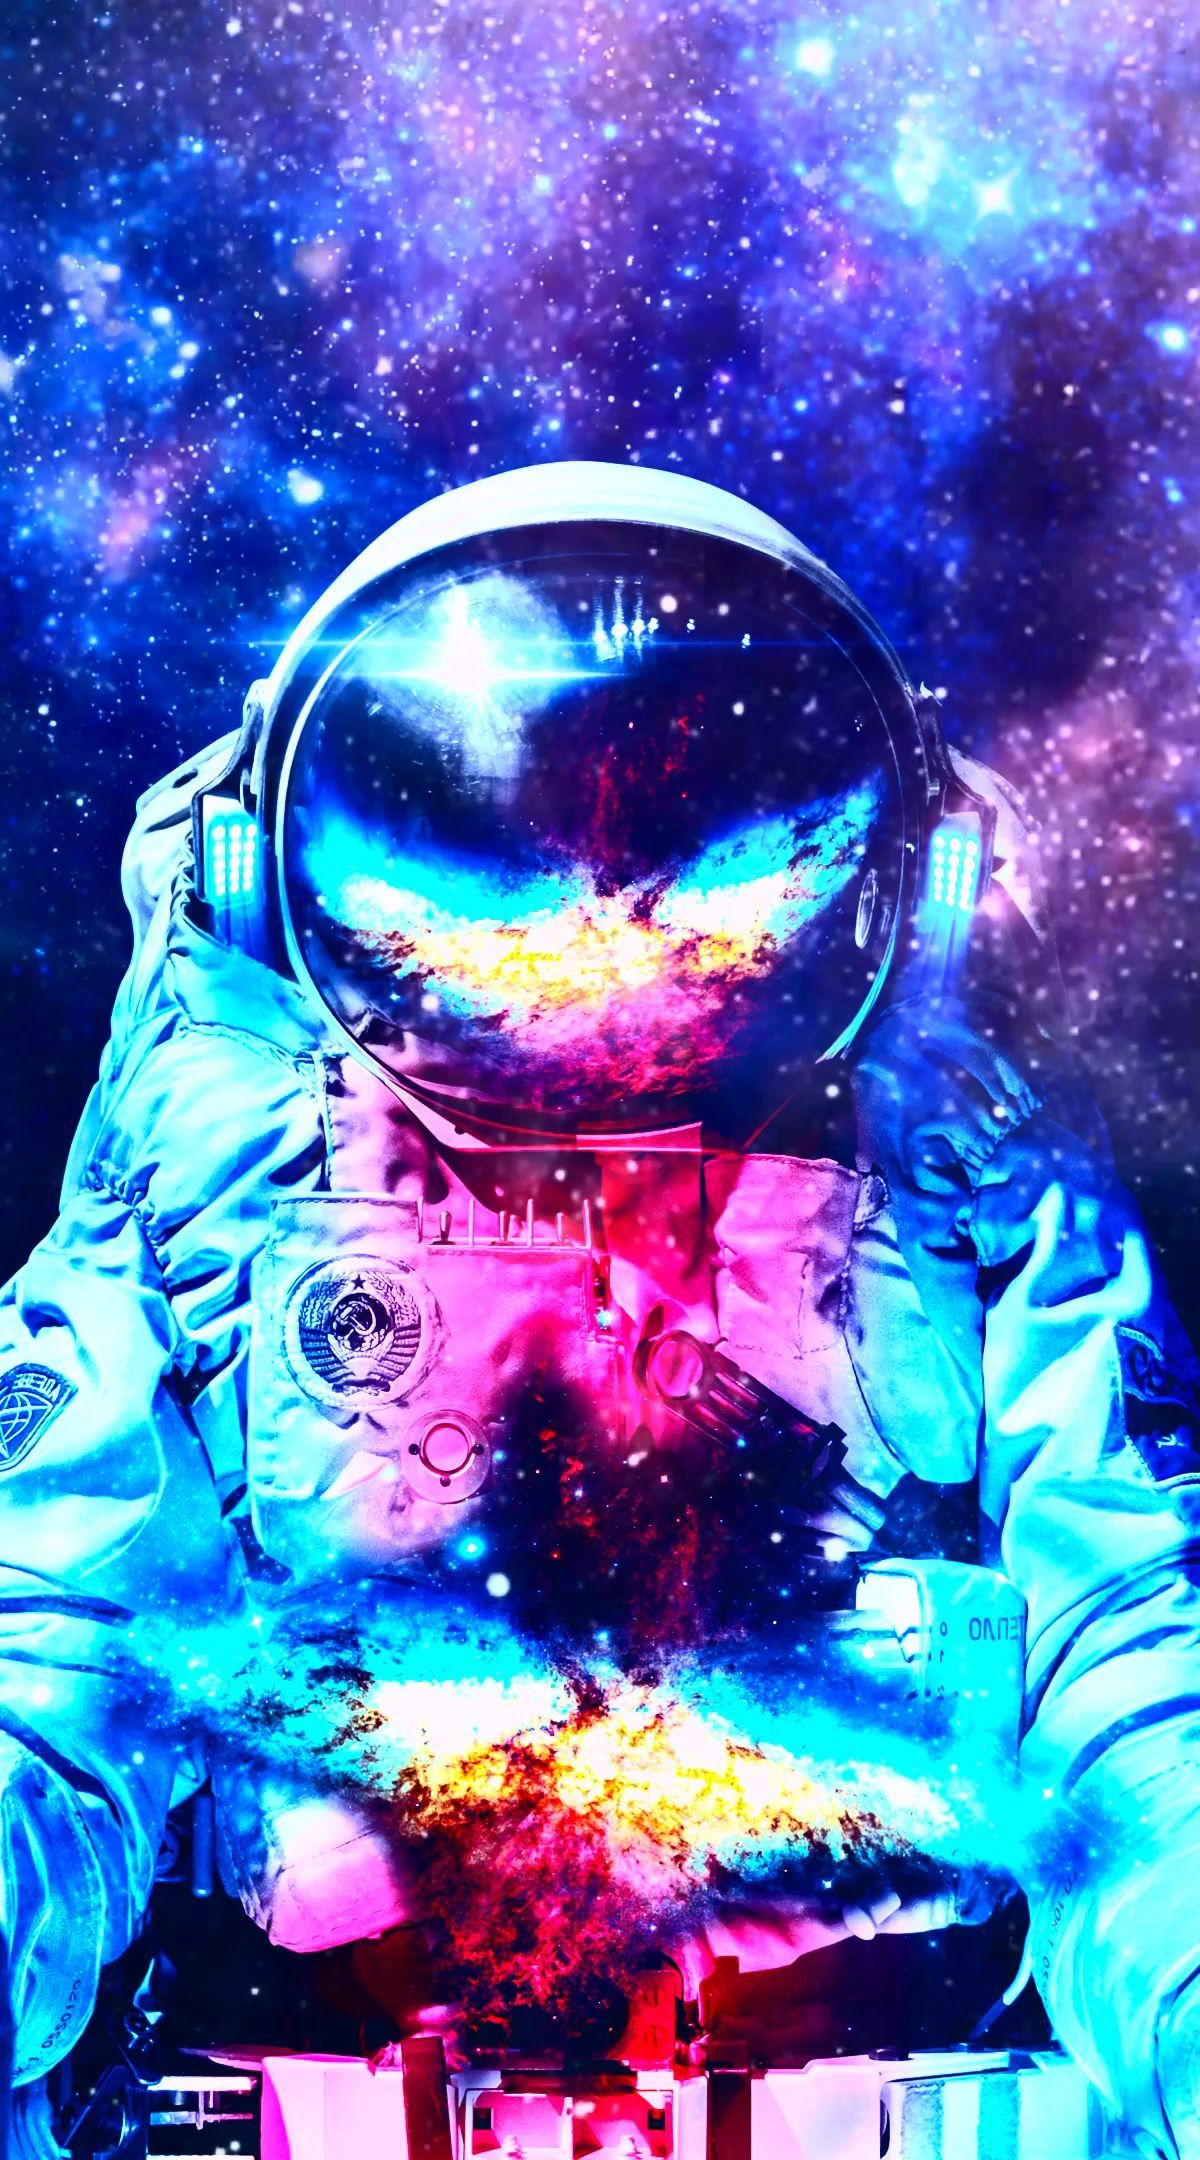 Planet Astronaut Galaxy Image By Lizeth Colunga Space Artwork Astronaut Wallpaper Astronaut Art